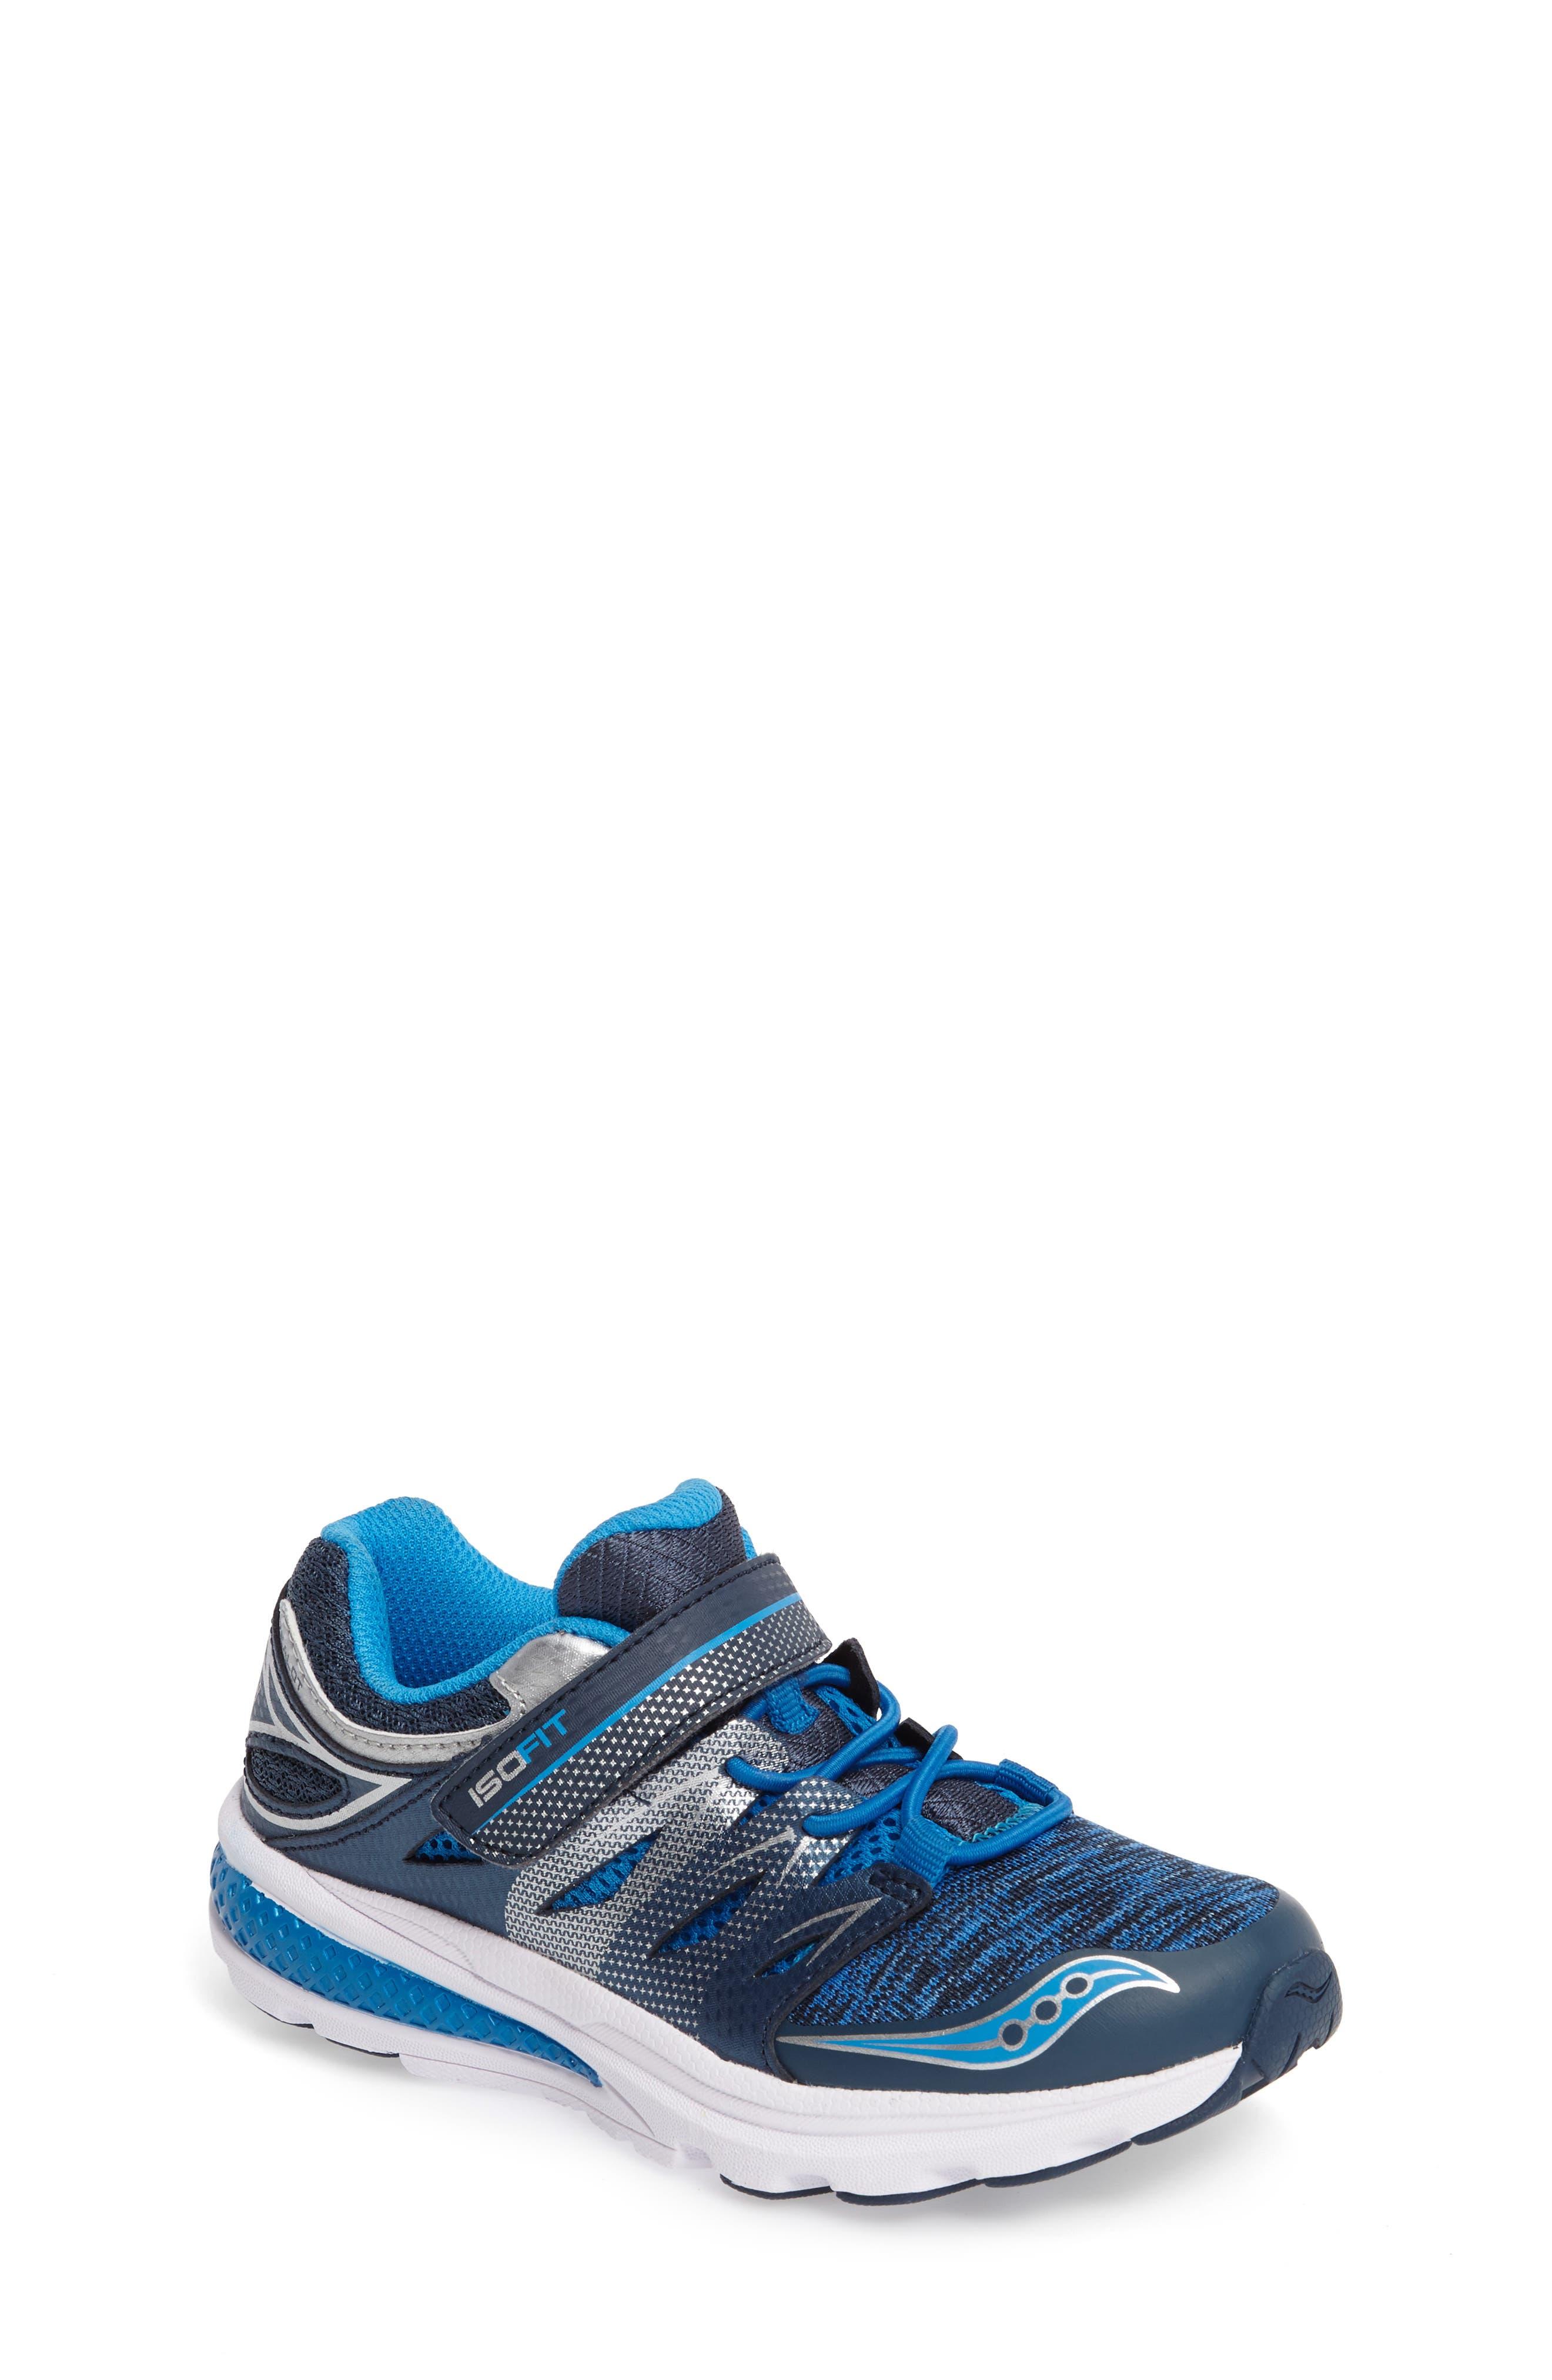 Zealot 2 A/C Sneaker,                             Main thumbnail 1, color,                             Royal/ Navy